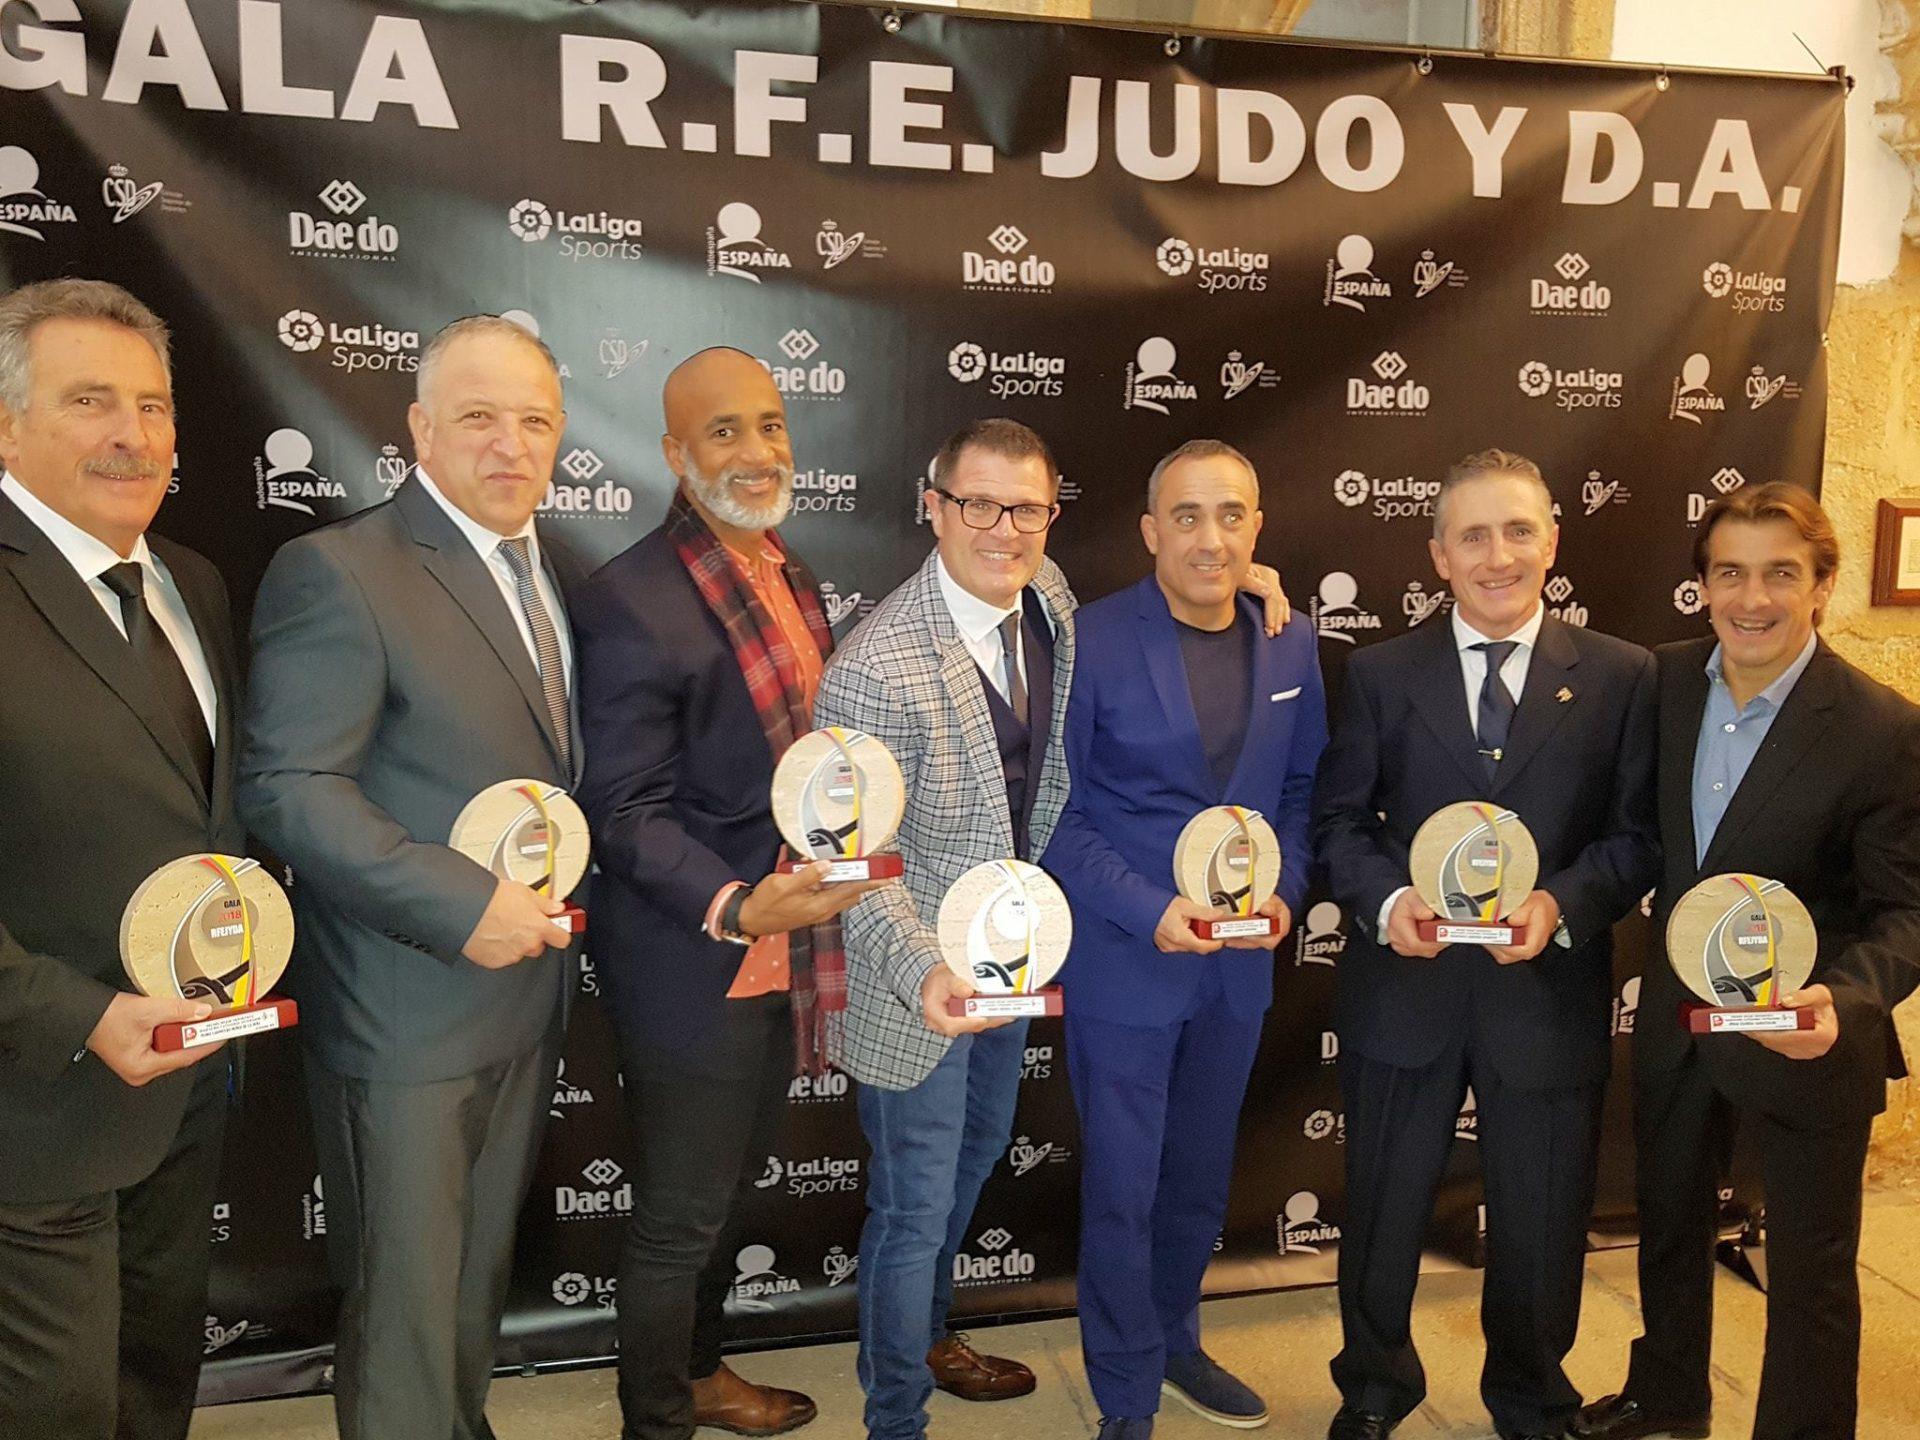 TM5 equipo campeón de Europa de Judo veteranos 2019